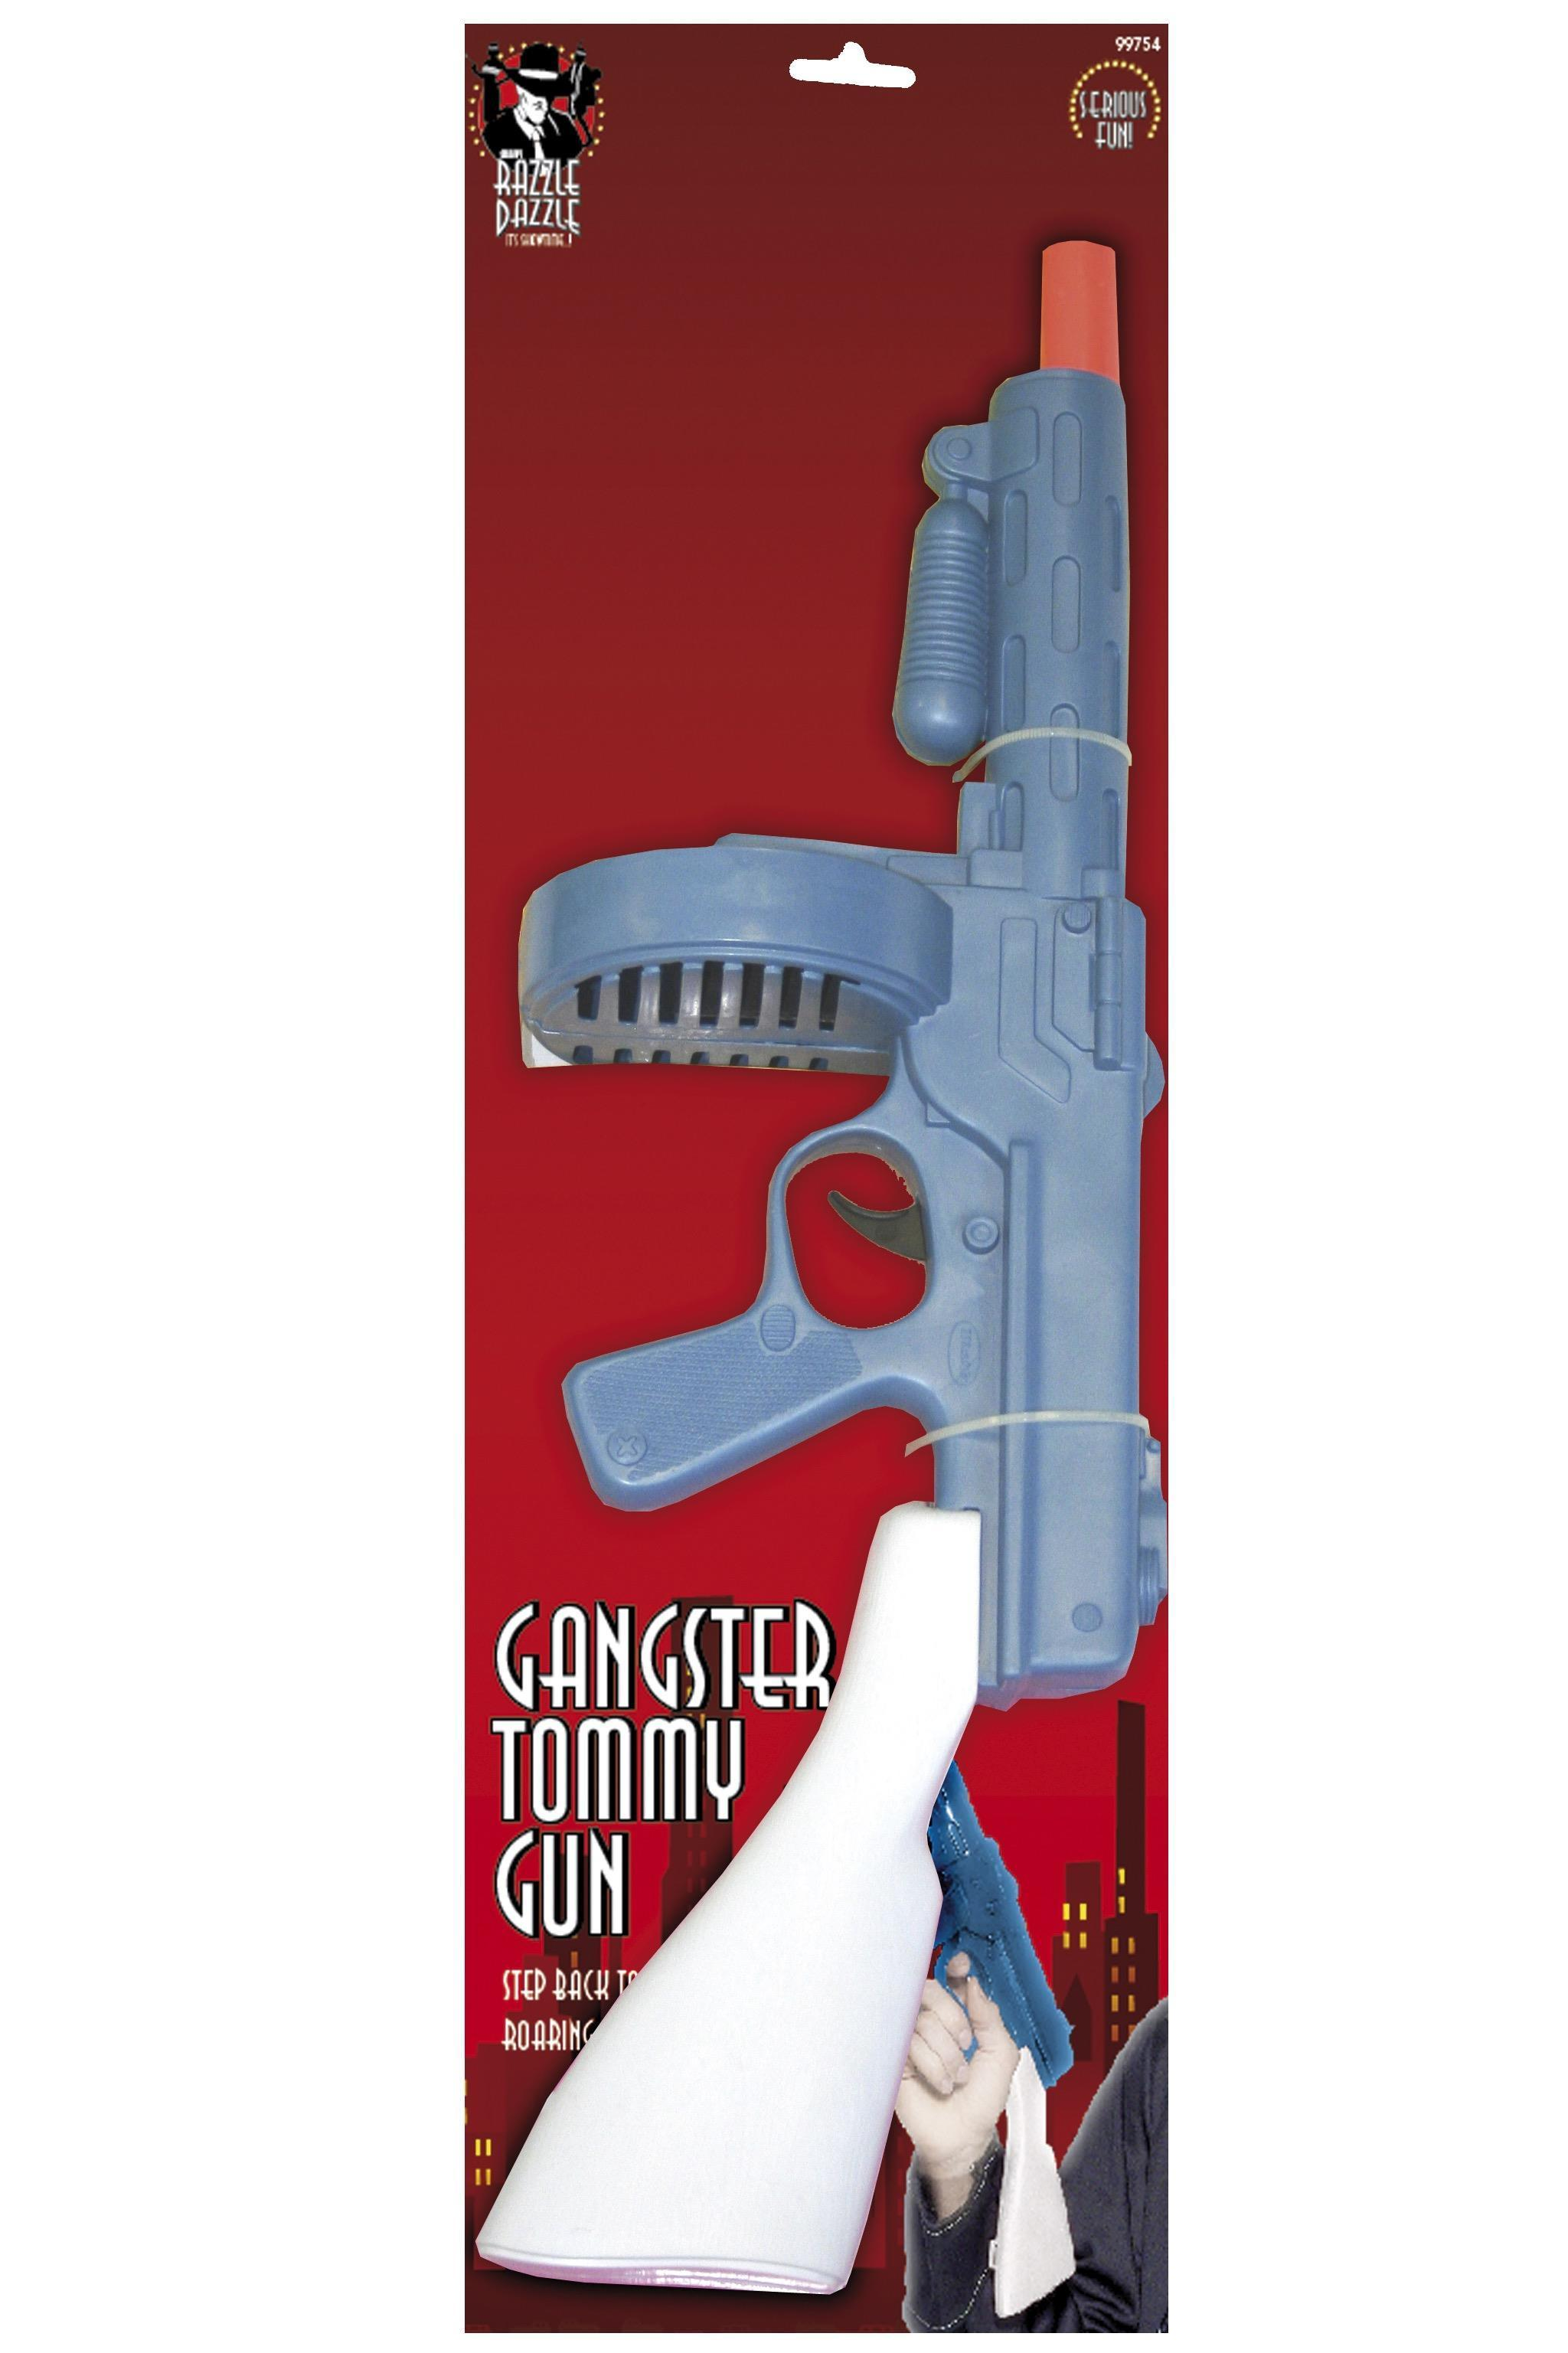 Marilyn Monroe Tommy Gun: Gangster Tommy Gun